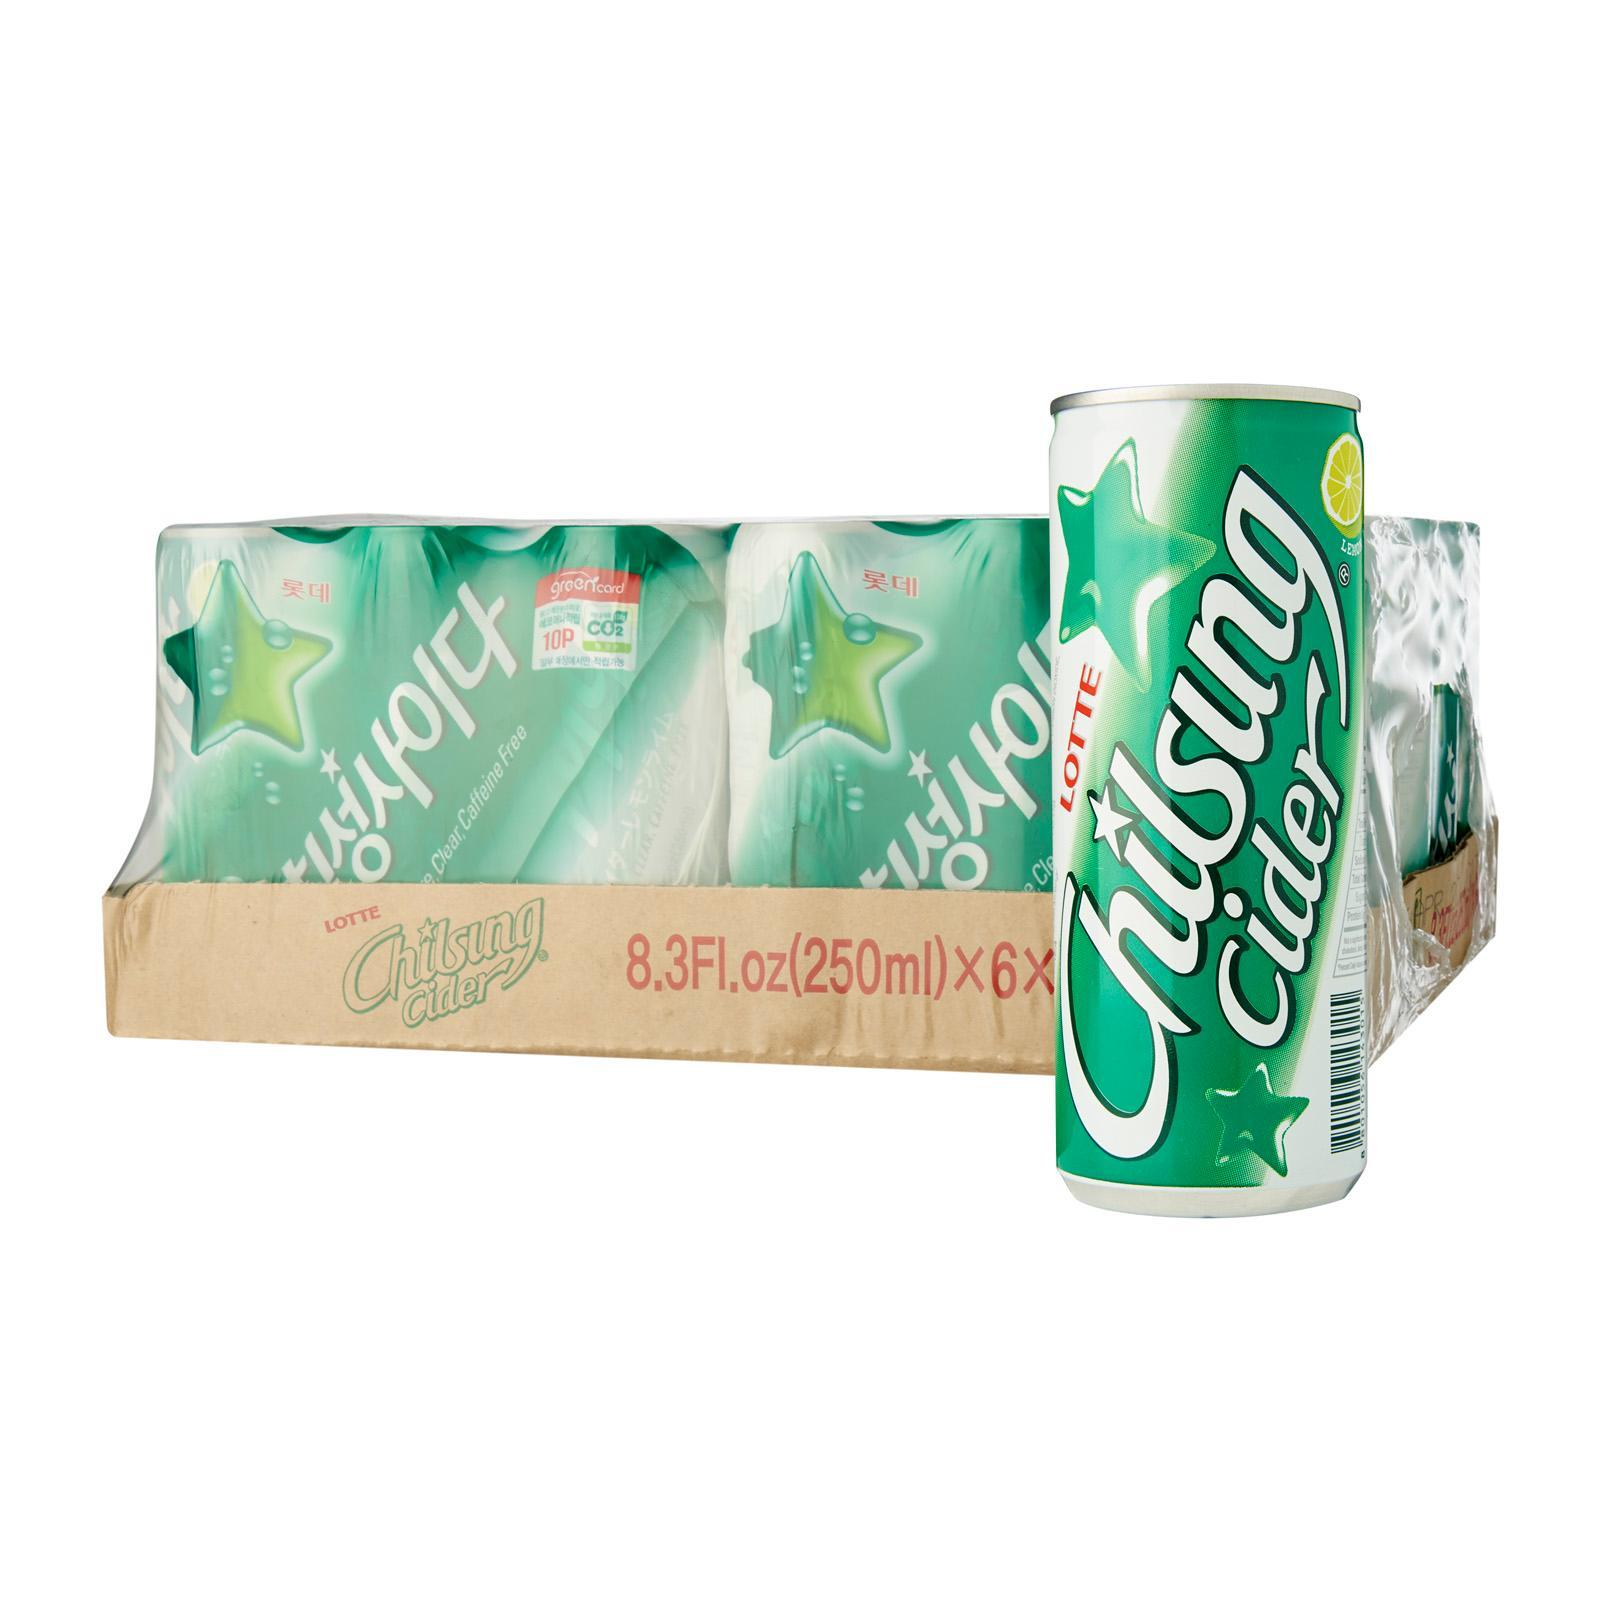 Lotte Chilsung Cider Soda Lemon-Lime Soda Water - Case